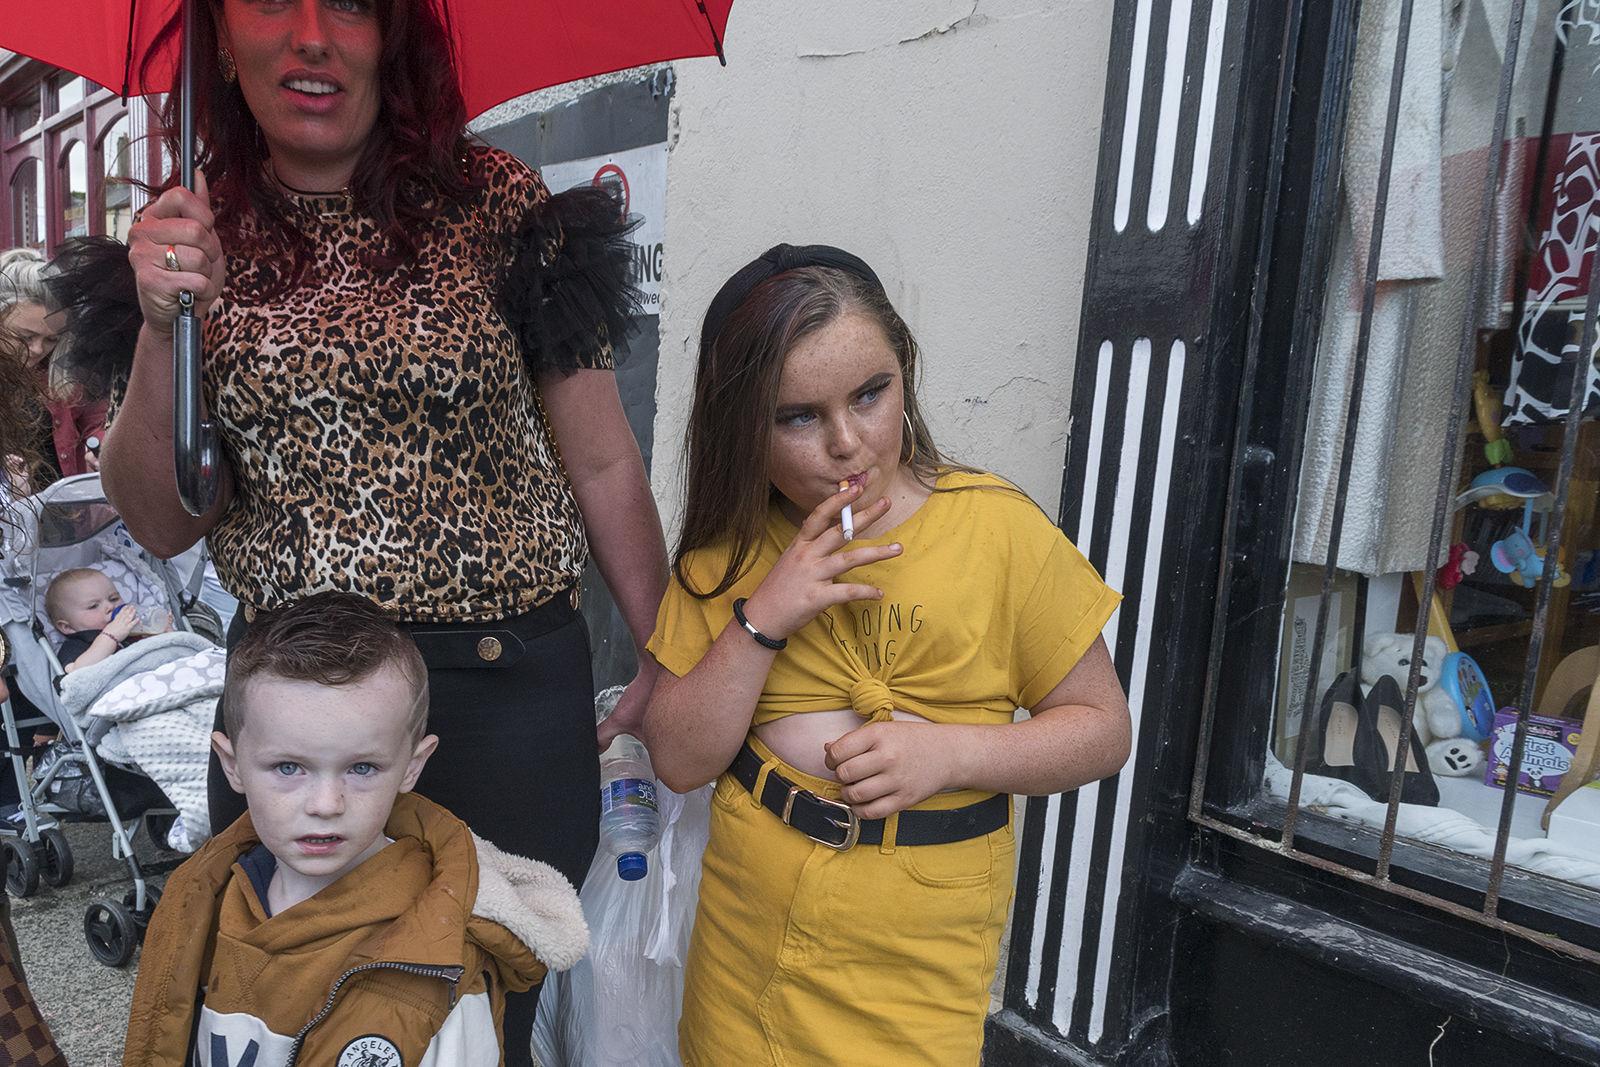 Toy Cigarette, Galway, Ireland 2019